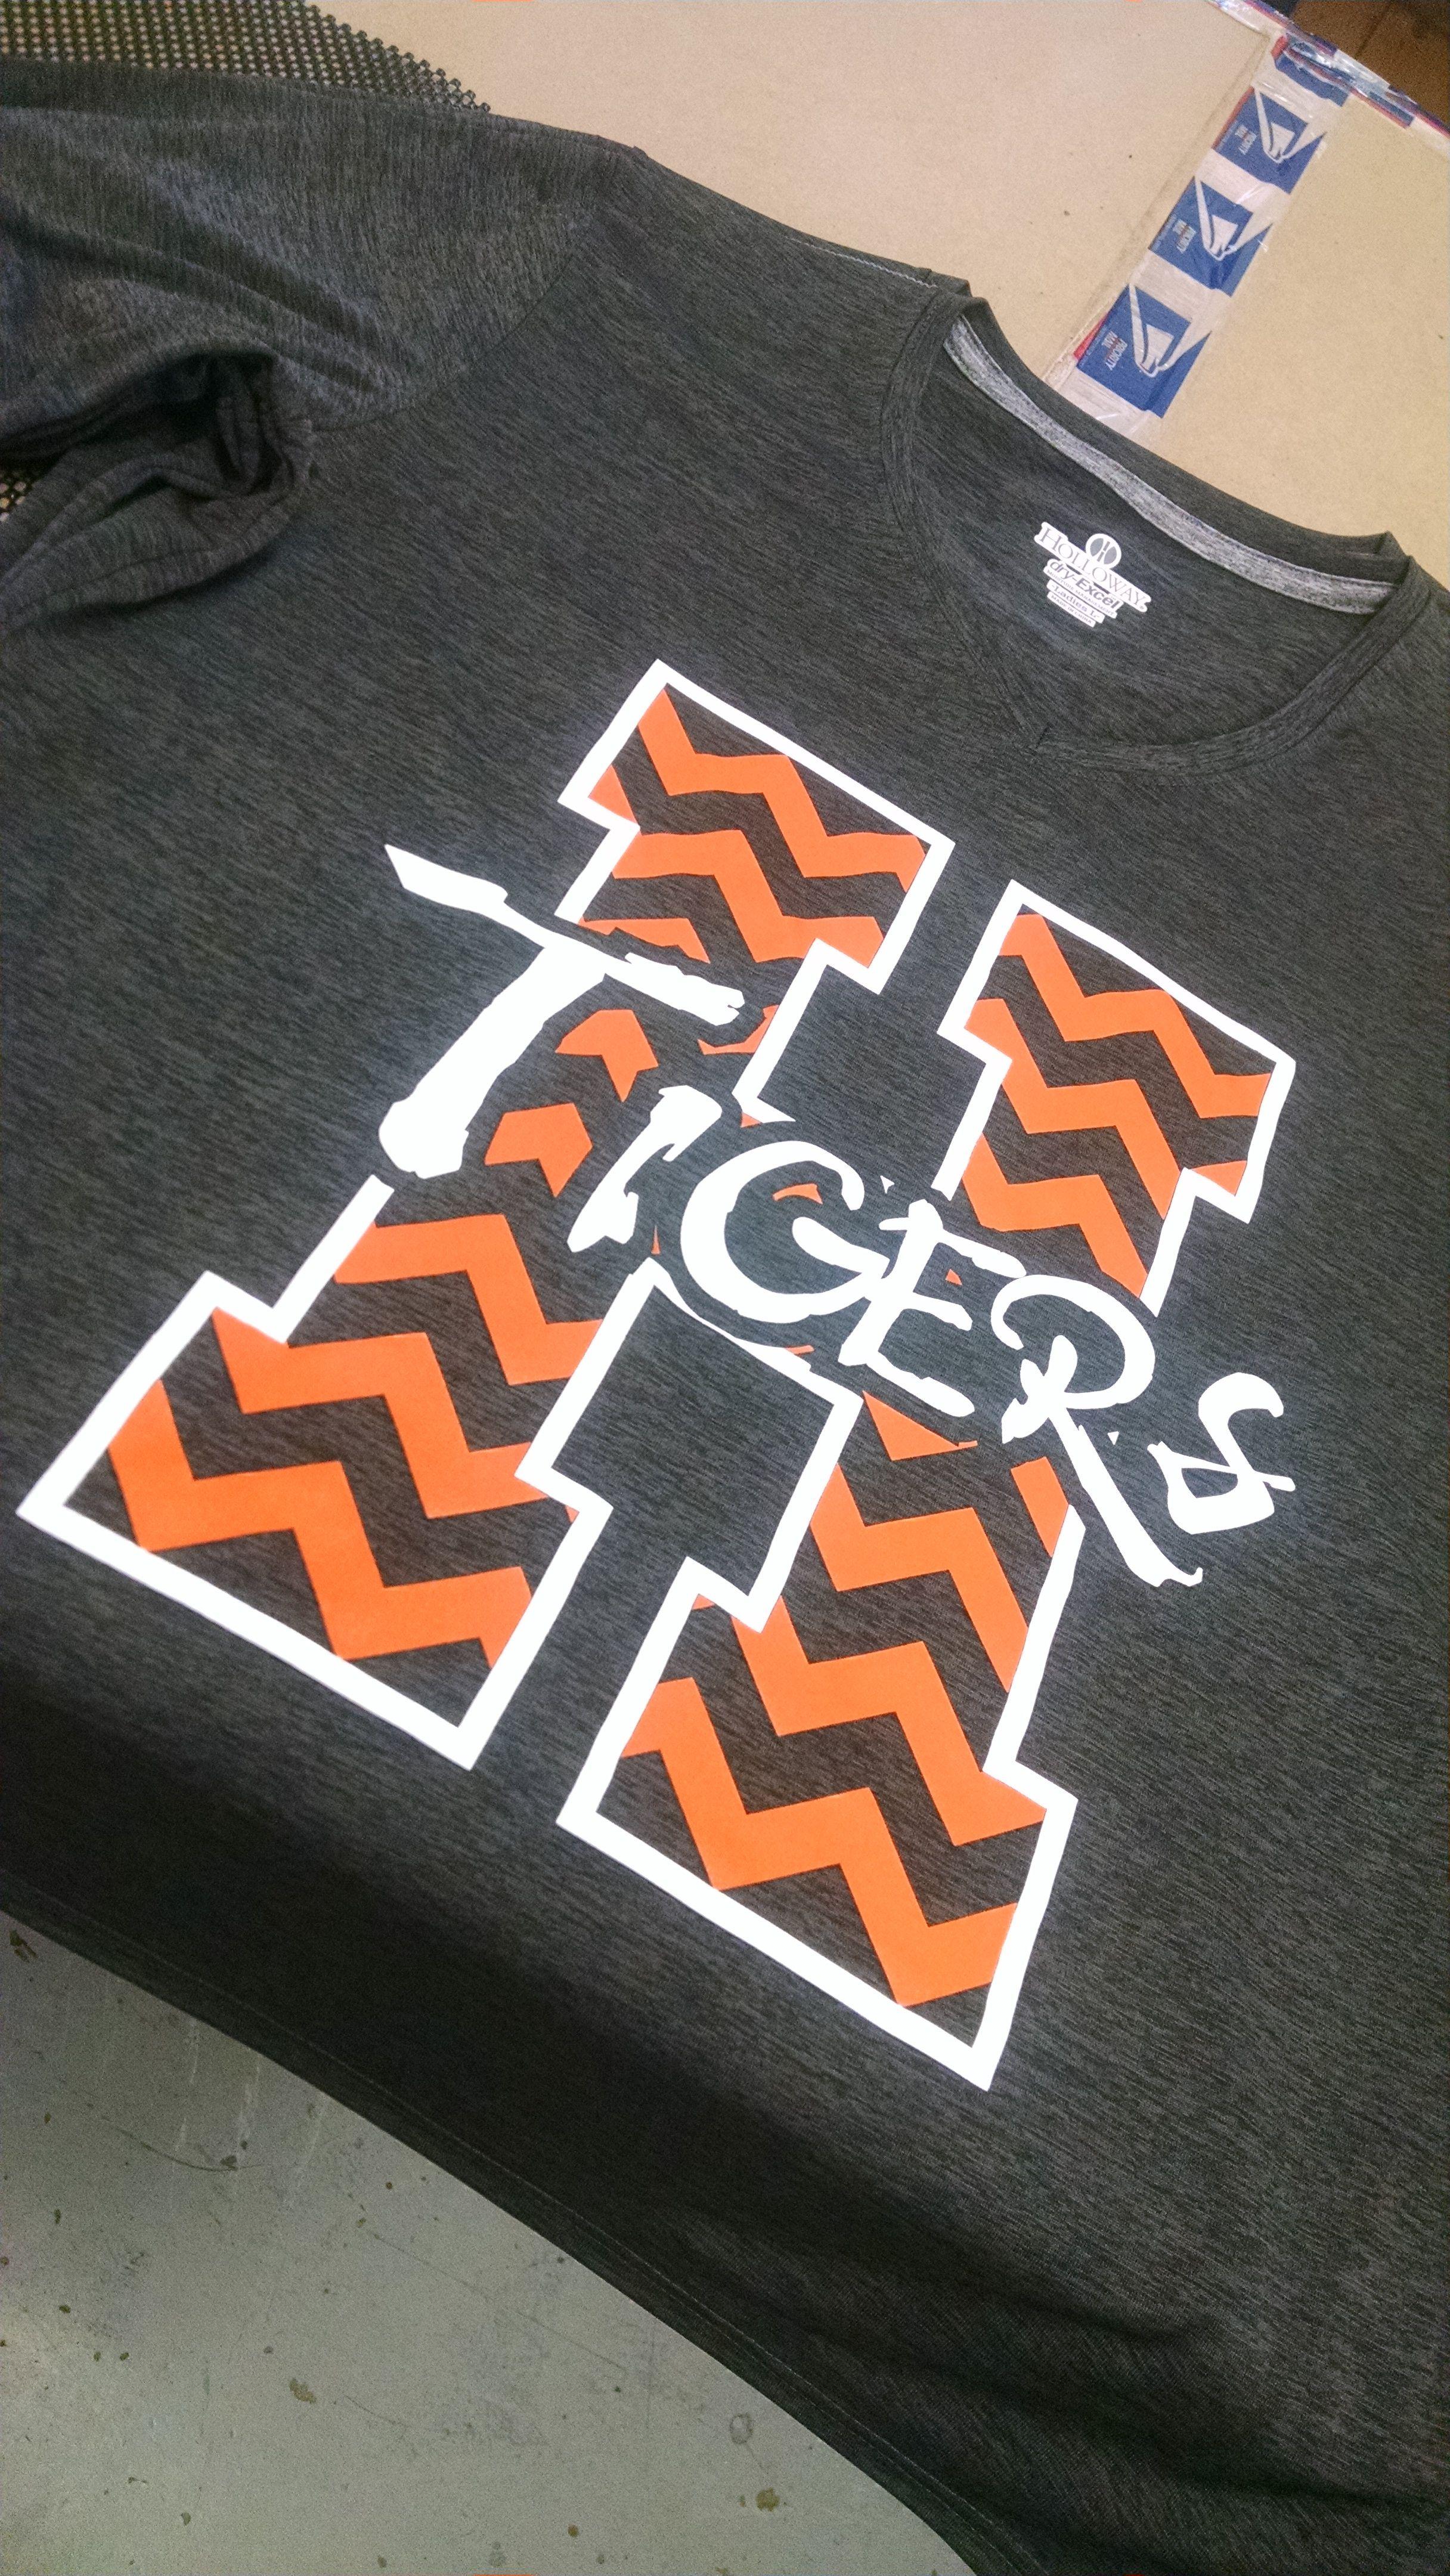 Hastings Tiger Chevron Apparel T Shirt Tee Shirt Design